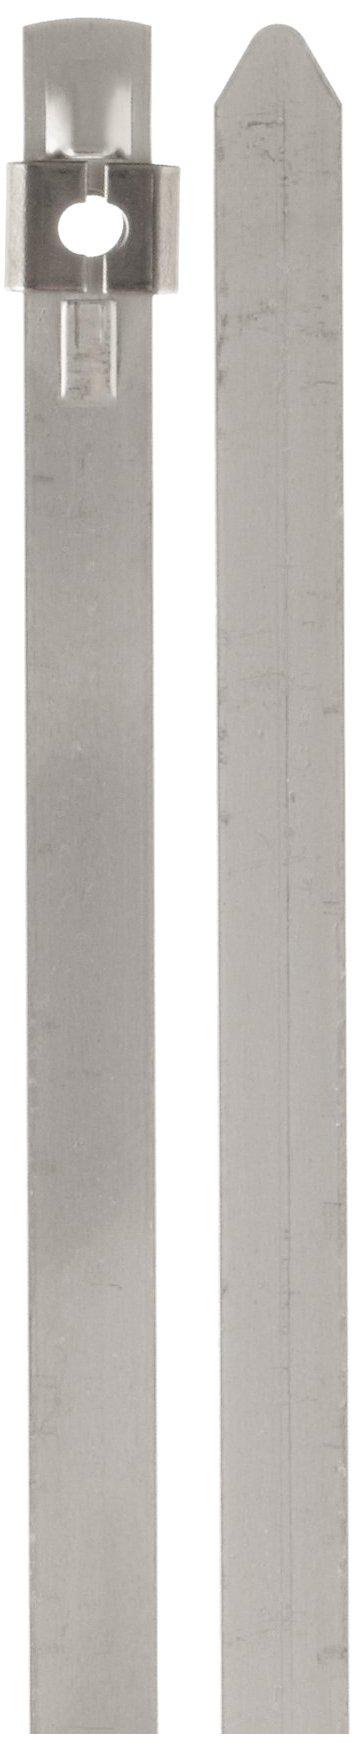 BAND-IT AS2139 Tie-Lok 304 Stainless Steel Cable Tie, 1/4'' Width, 22.5'' Length, 6'' Maximum Diameter, 100 per Bag